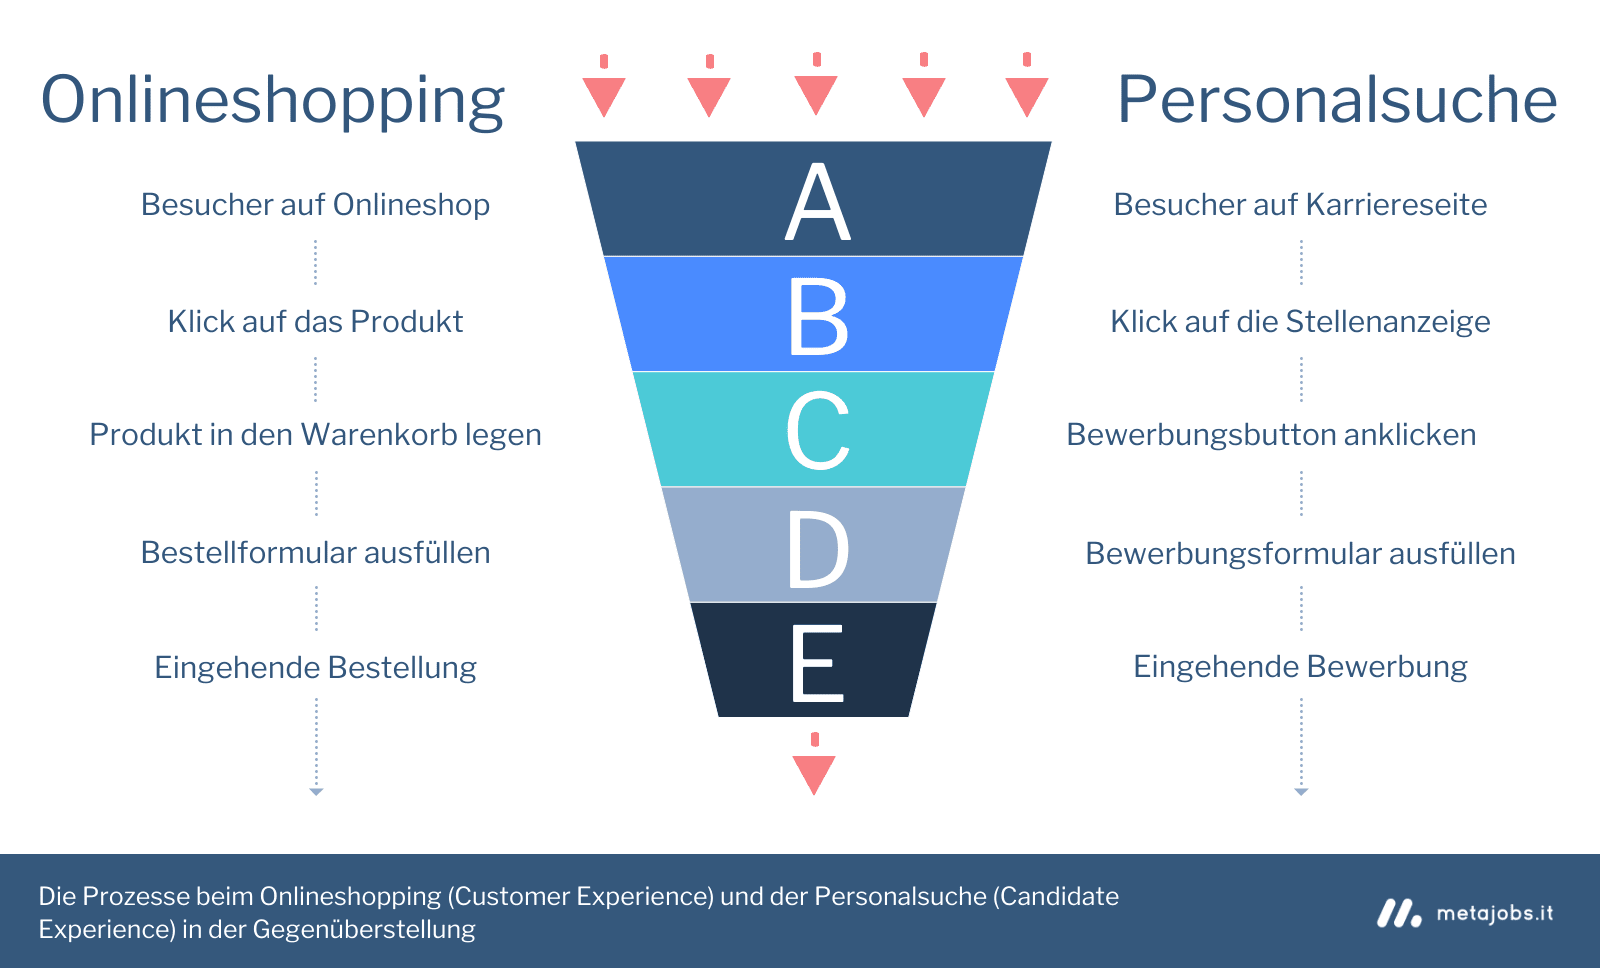 Recruiting-Prozesse und E-Commerce im Vergleich - Infografik